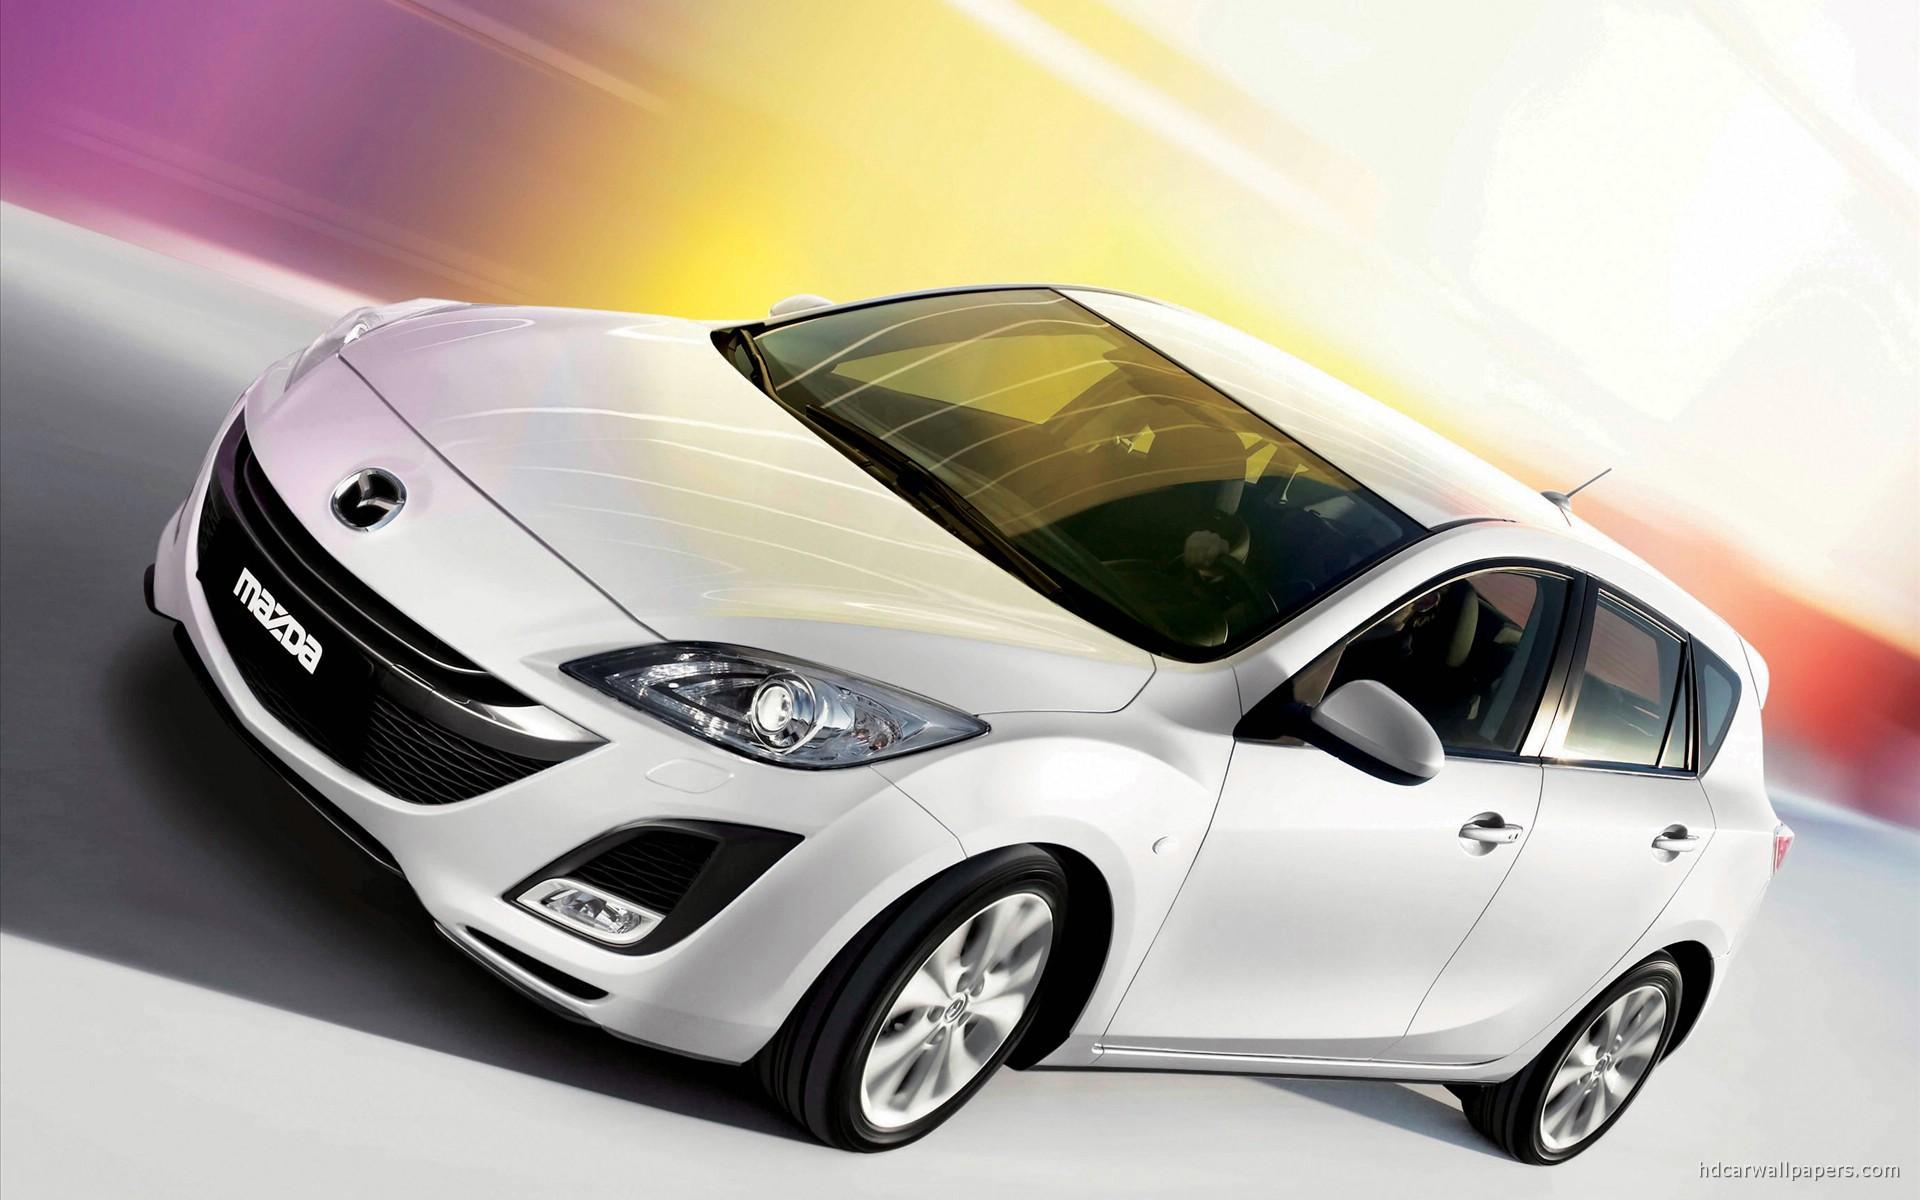 New Mazda 3 i Stop Wallpaper | HD Car Wallpapers | ID #1162